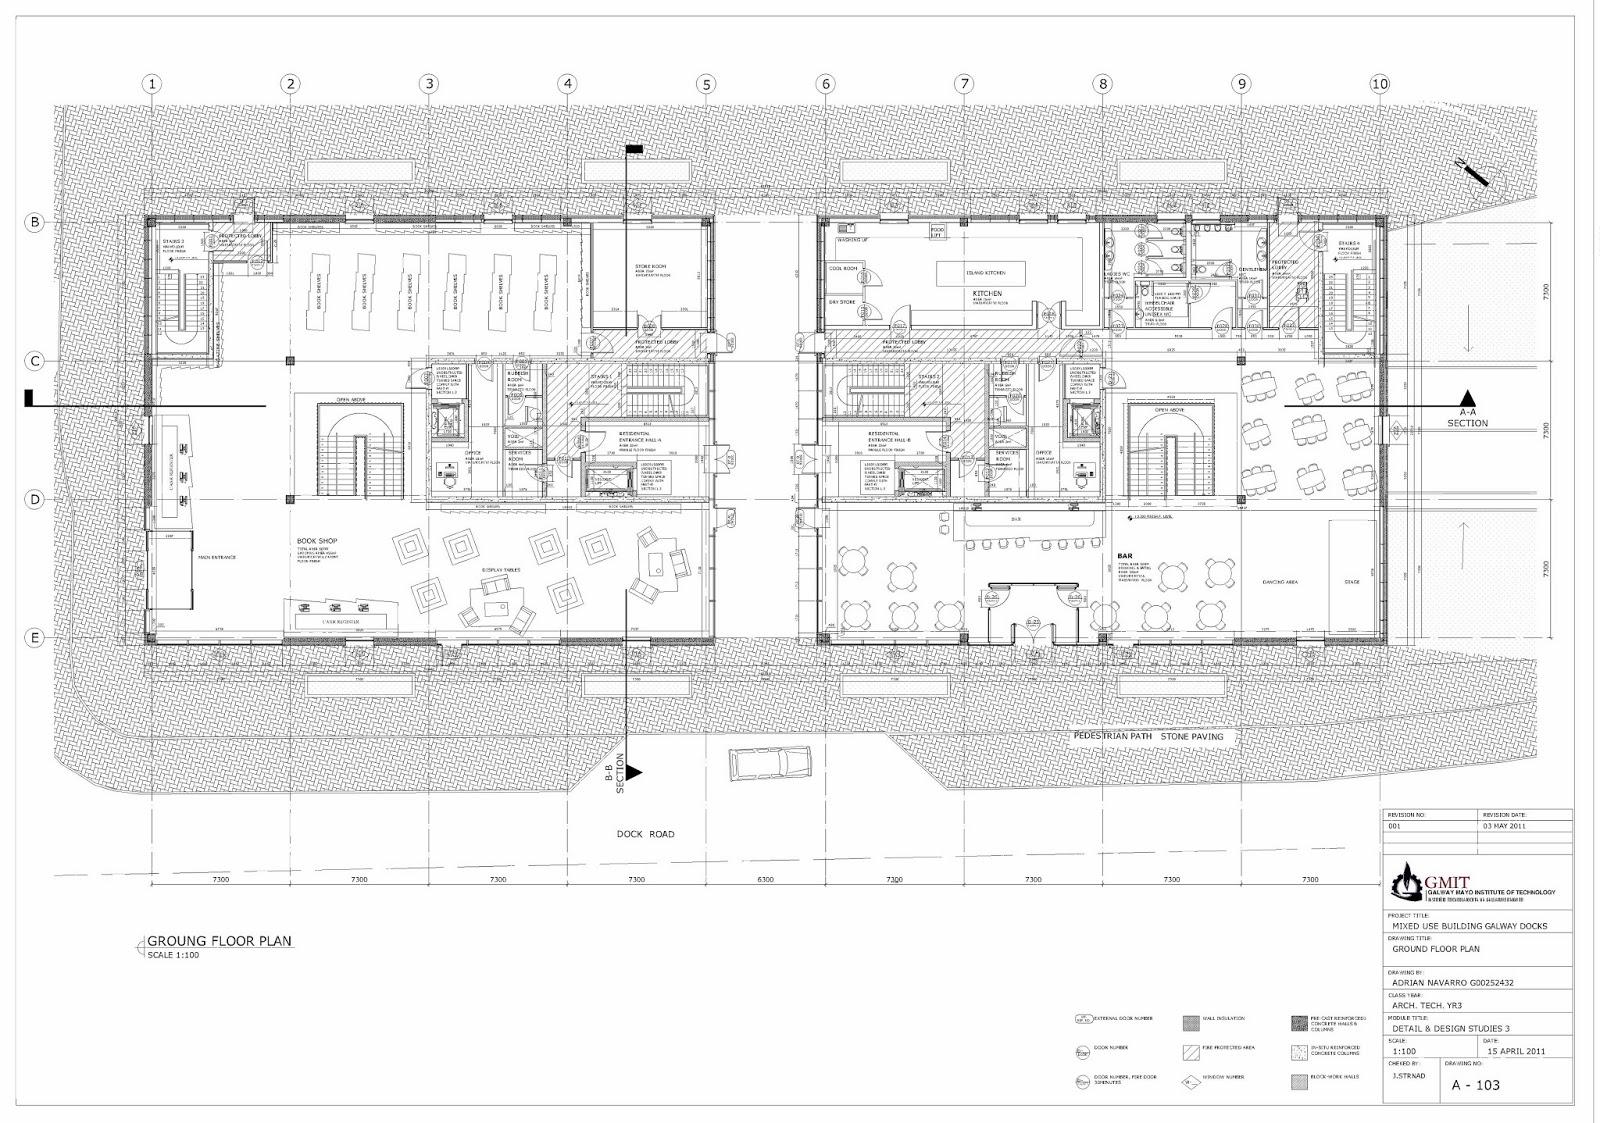 Navarro Architect Technologist Project 04 Galway Docks